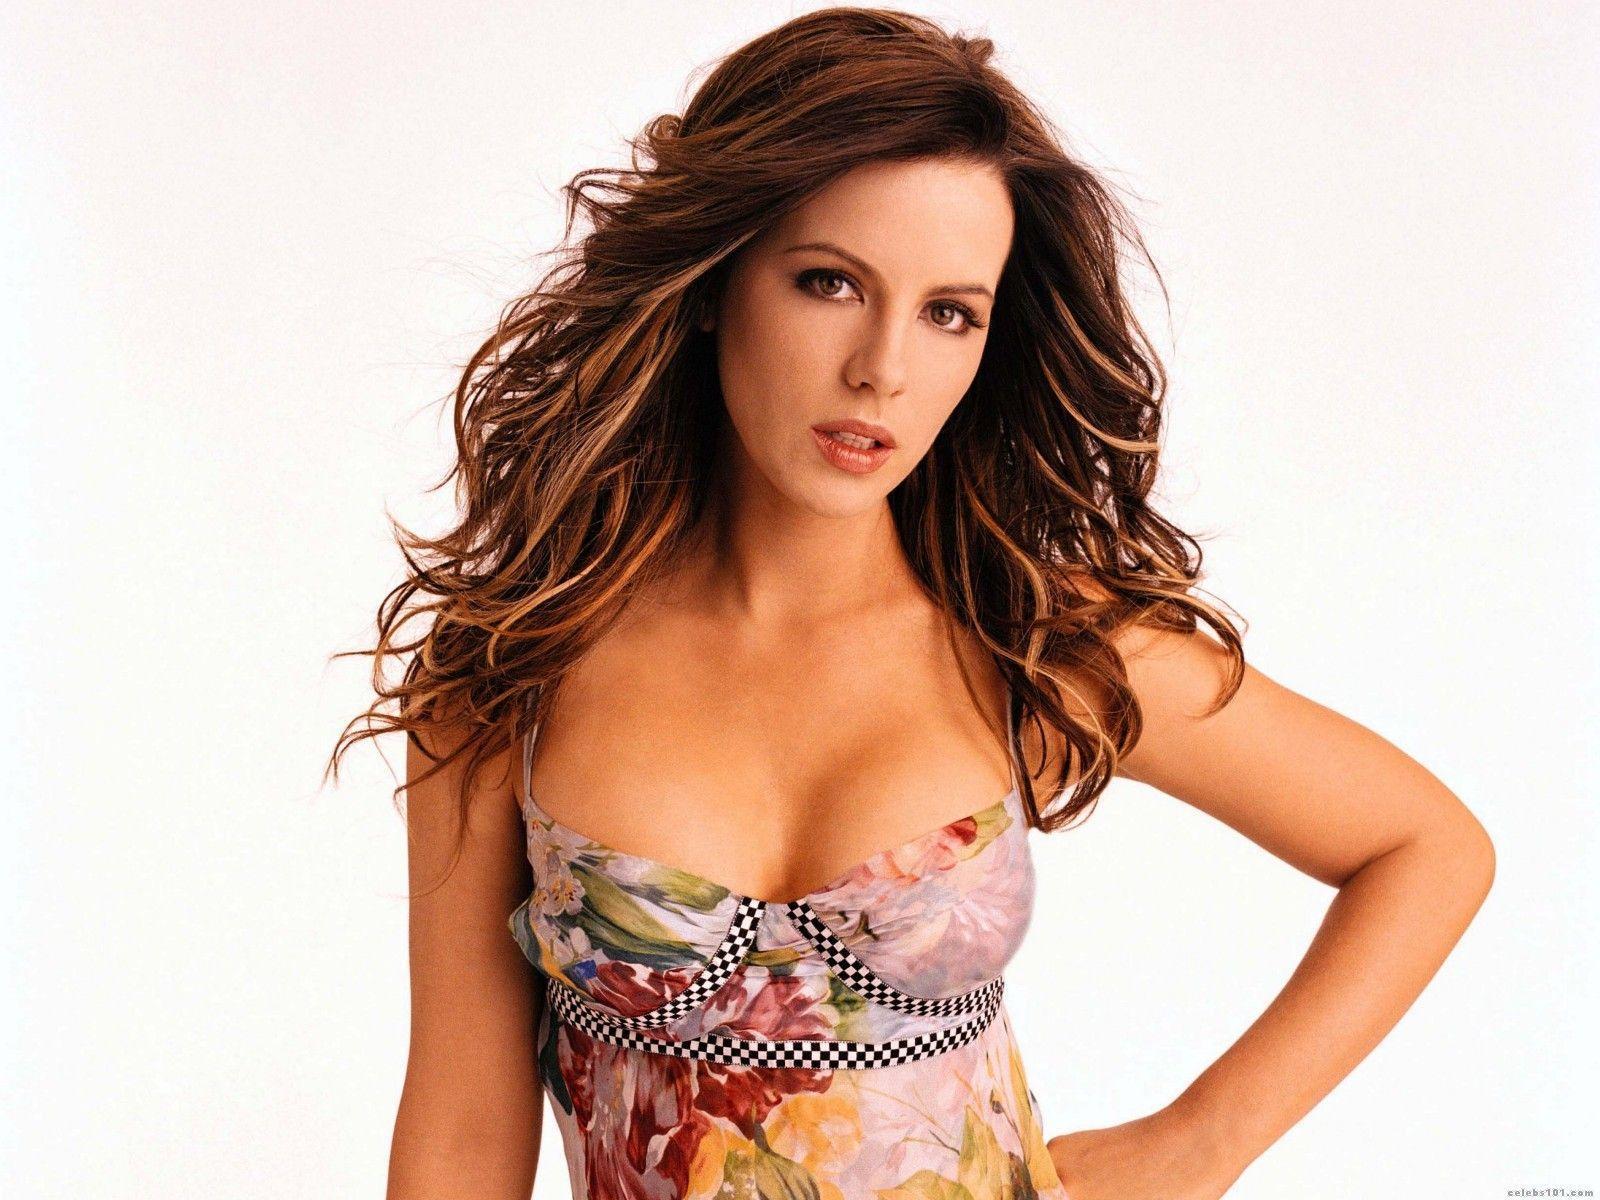 http://images2.fanpop.com/images/photos/4700000/Kate-Beckinsale-kate-beckinsale-4731702-1600-1200.jpg